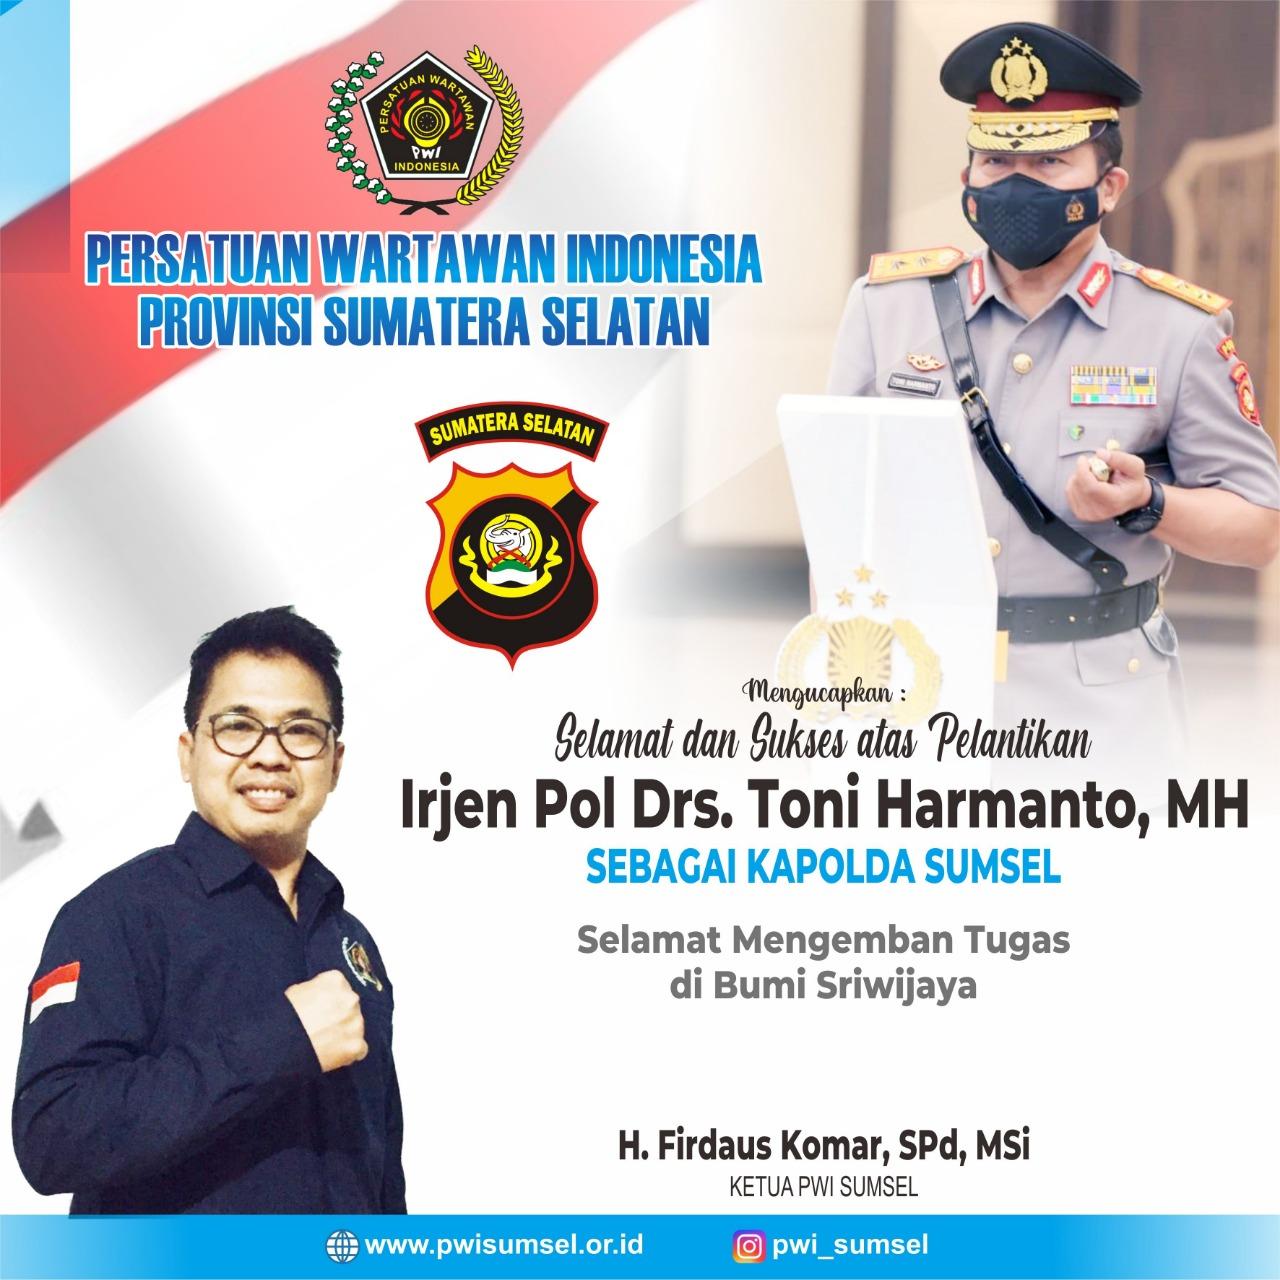 PWI Sumsel Mengucapkan Selamat Bertugas, Irjen Pol Drs Toni Harmanto MH Resmi Menjadi Kapolda Sumsel